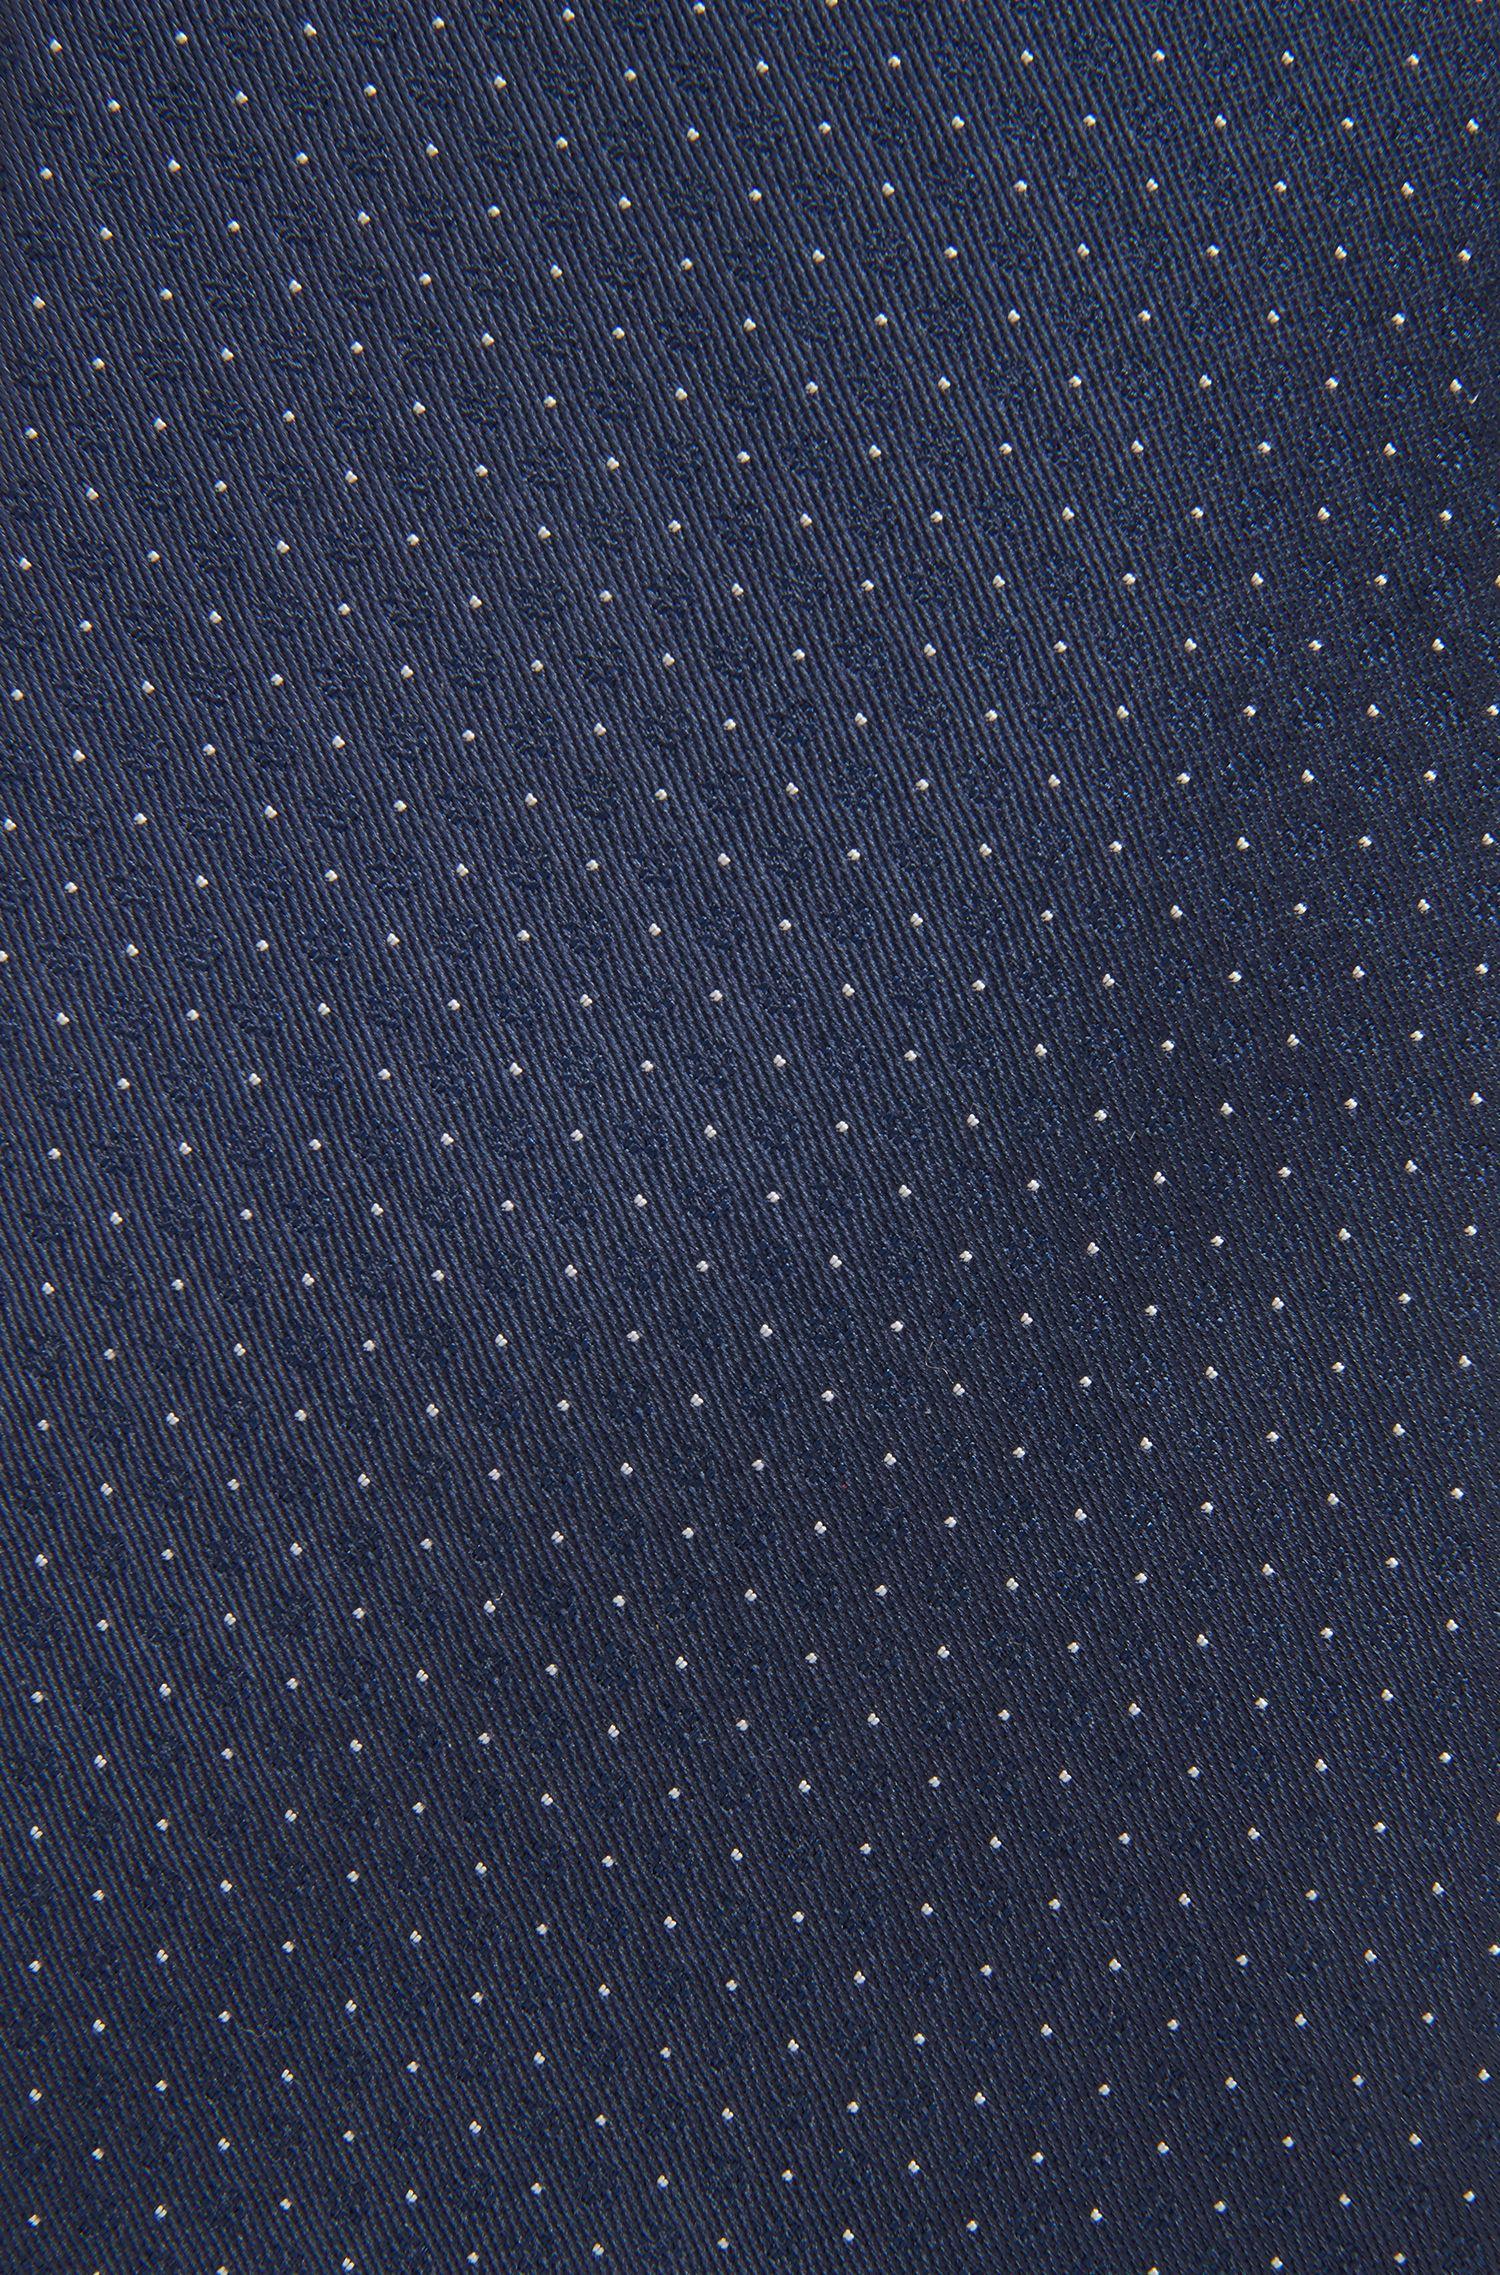 Cravatta in misto seta jacquard a microdisegni, Celeste